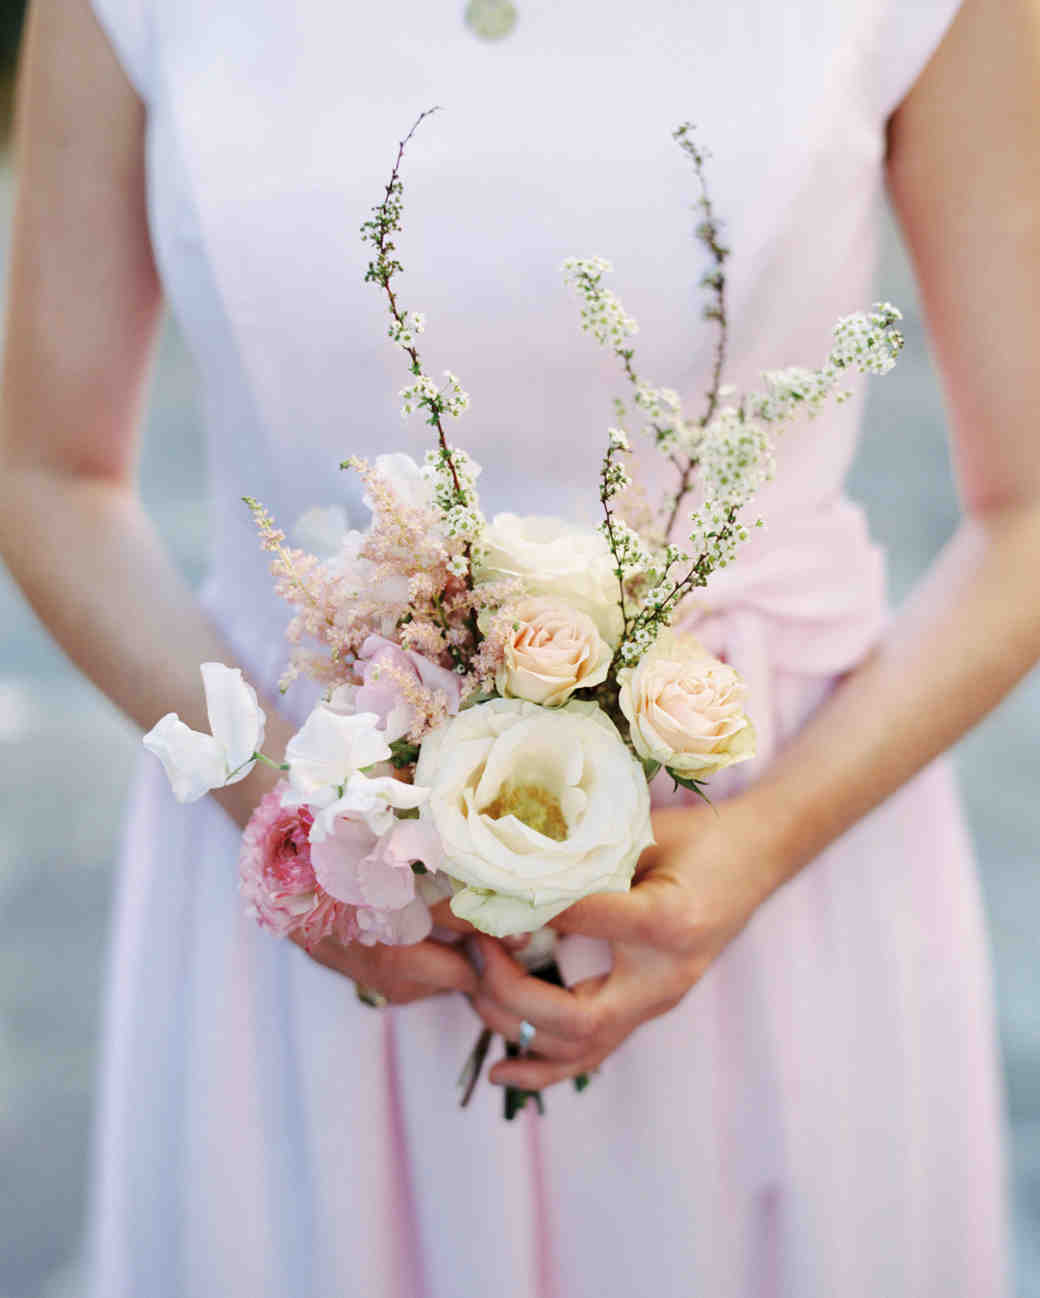 38 Ideas for Your Bridesmaids Bouquets Martha Stewart Weddings